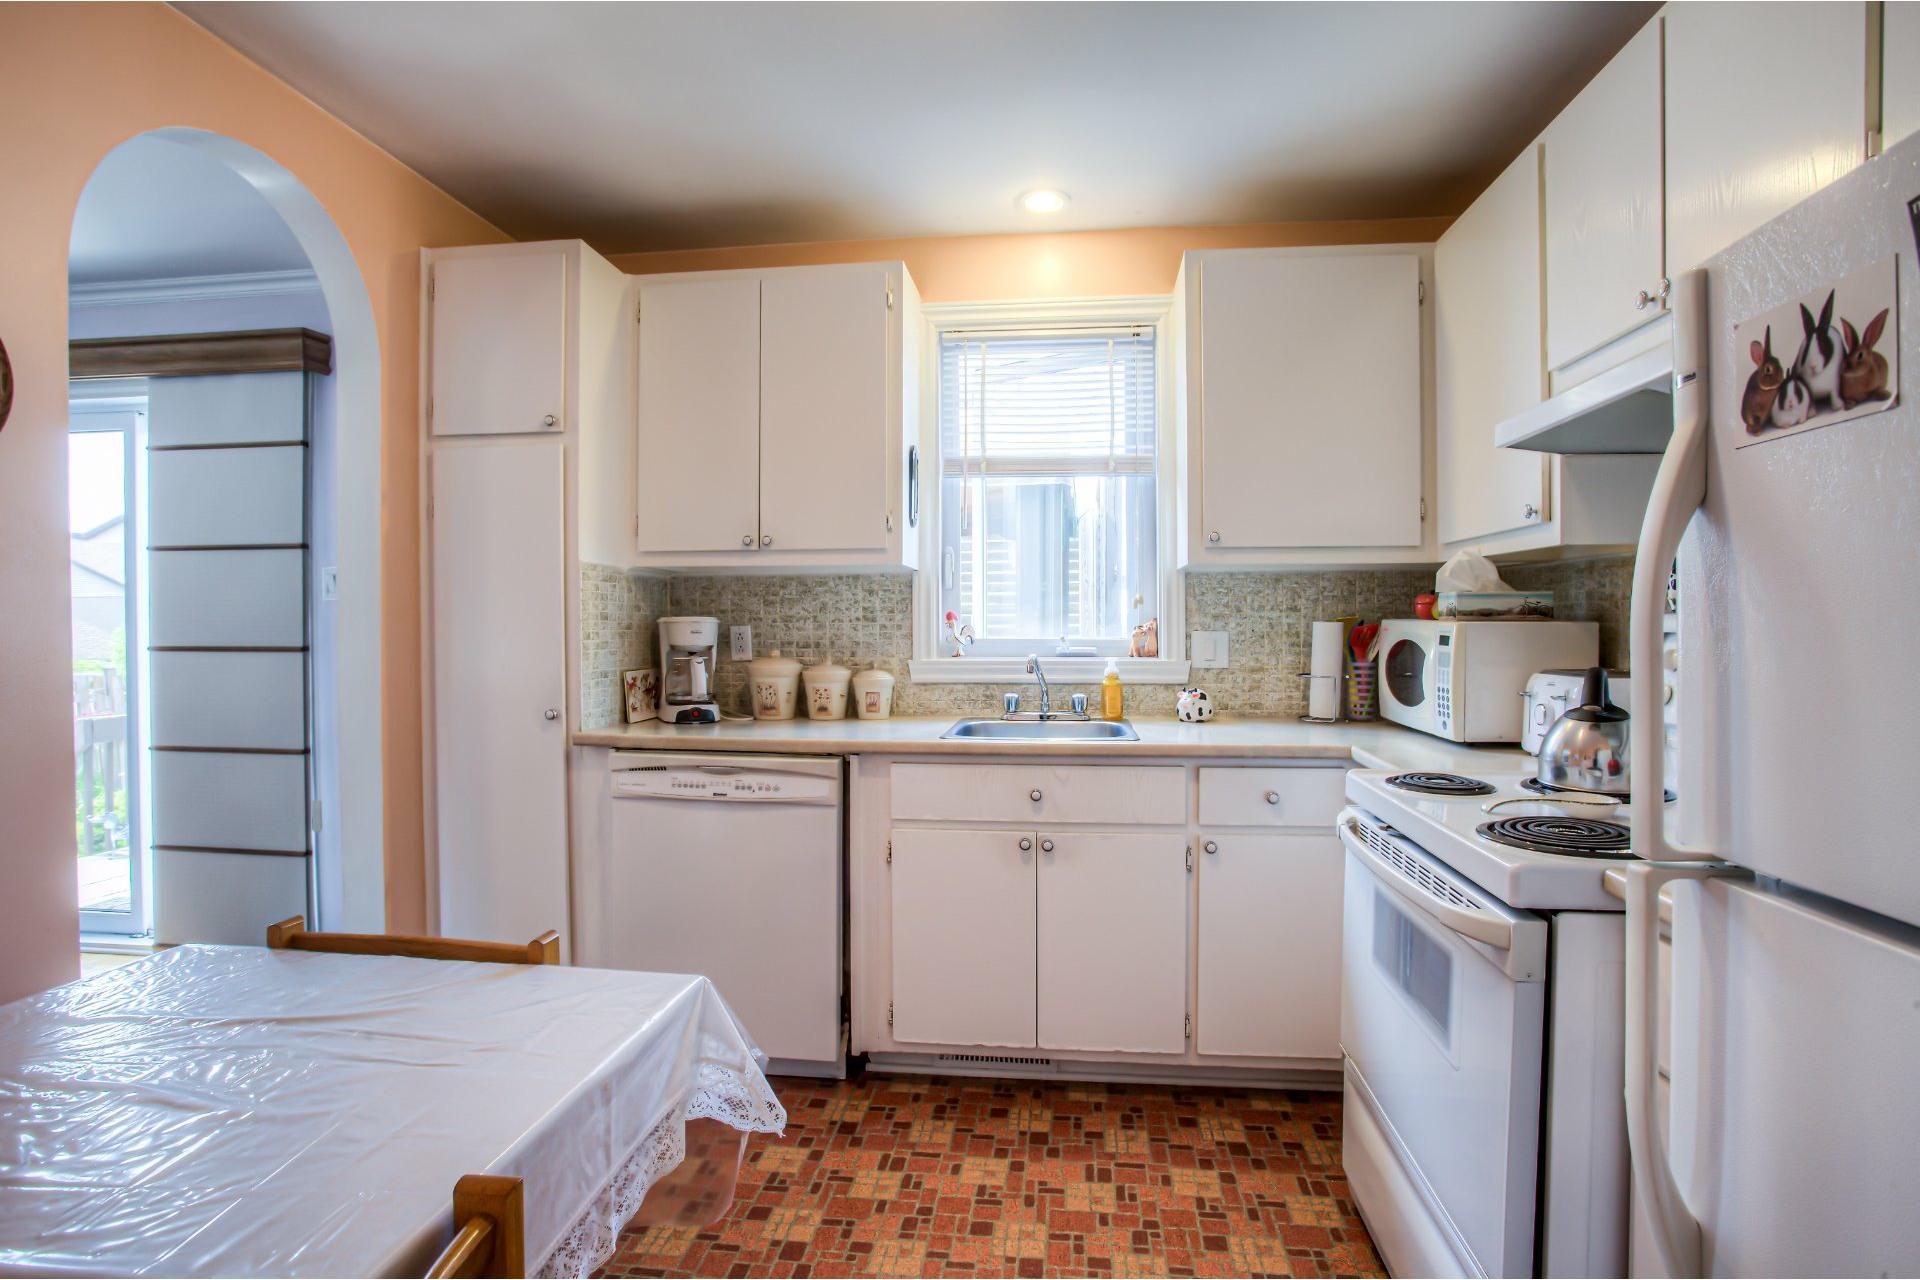 image 9 - House For sale Pierrefonds-Roxboro Montréal  - 10 rooms